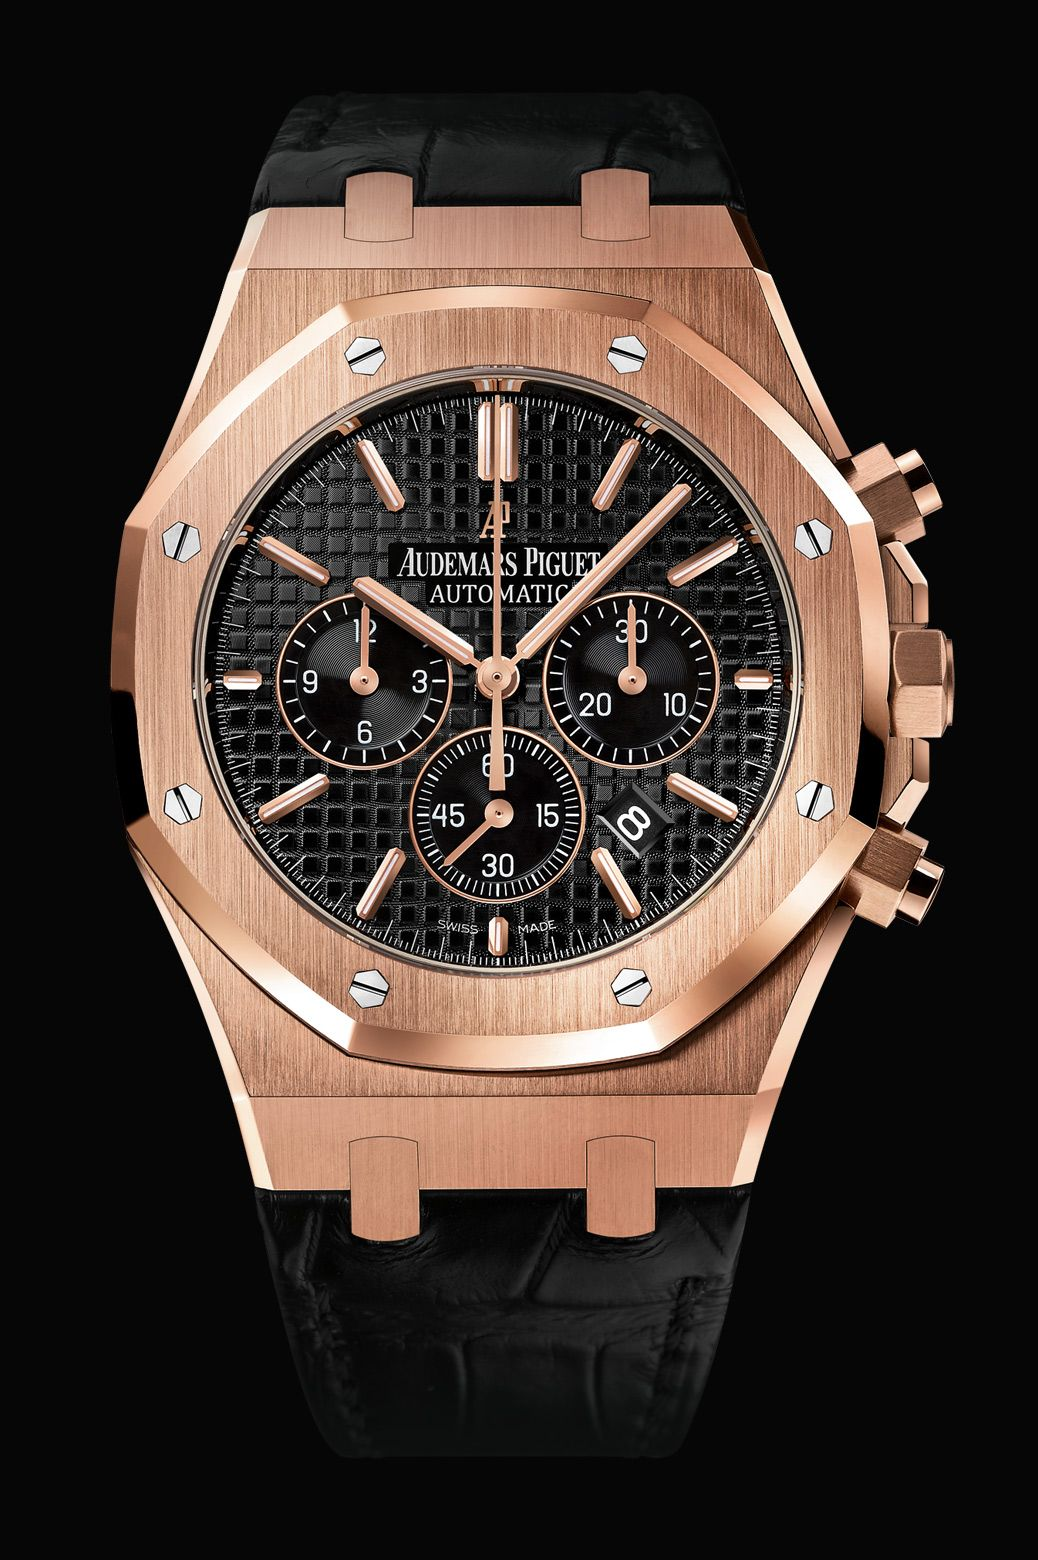 Ap Royal Oak Chronograph Pink Gold Black Dial Watches Audemars